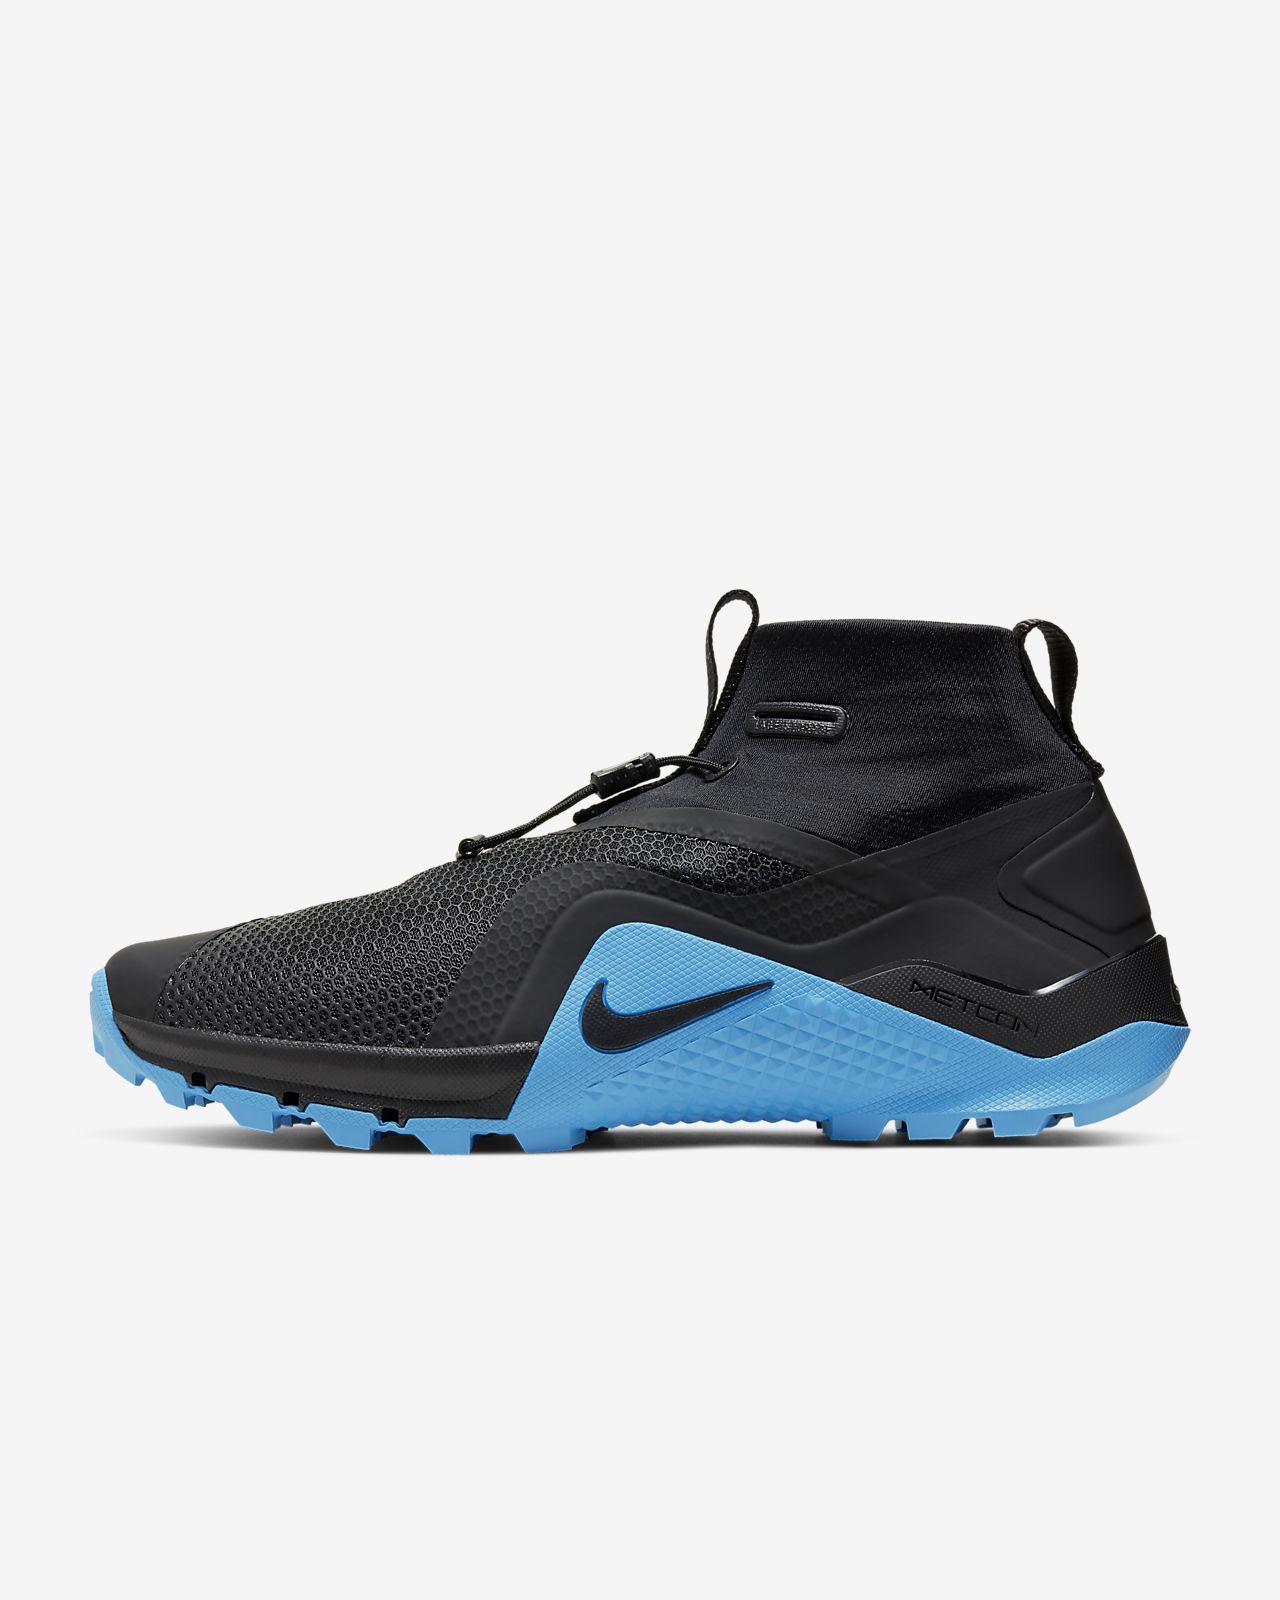 Träningssko Nike MetconSF